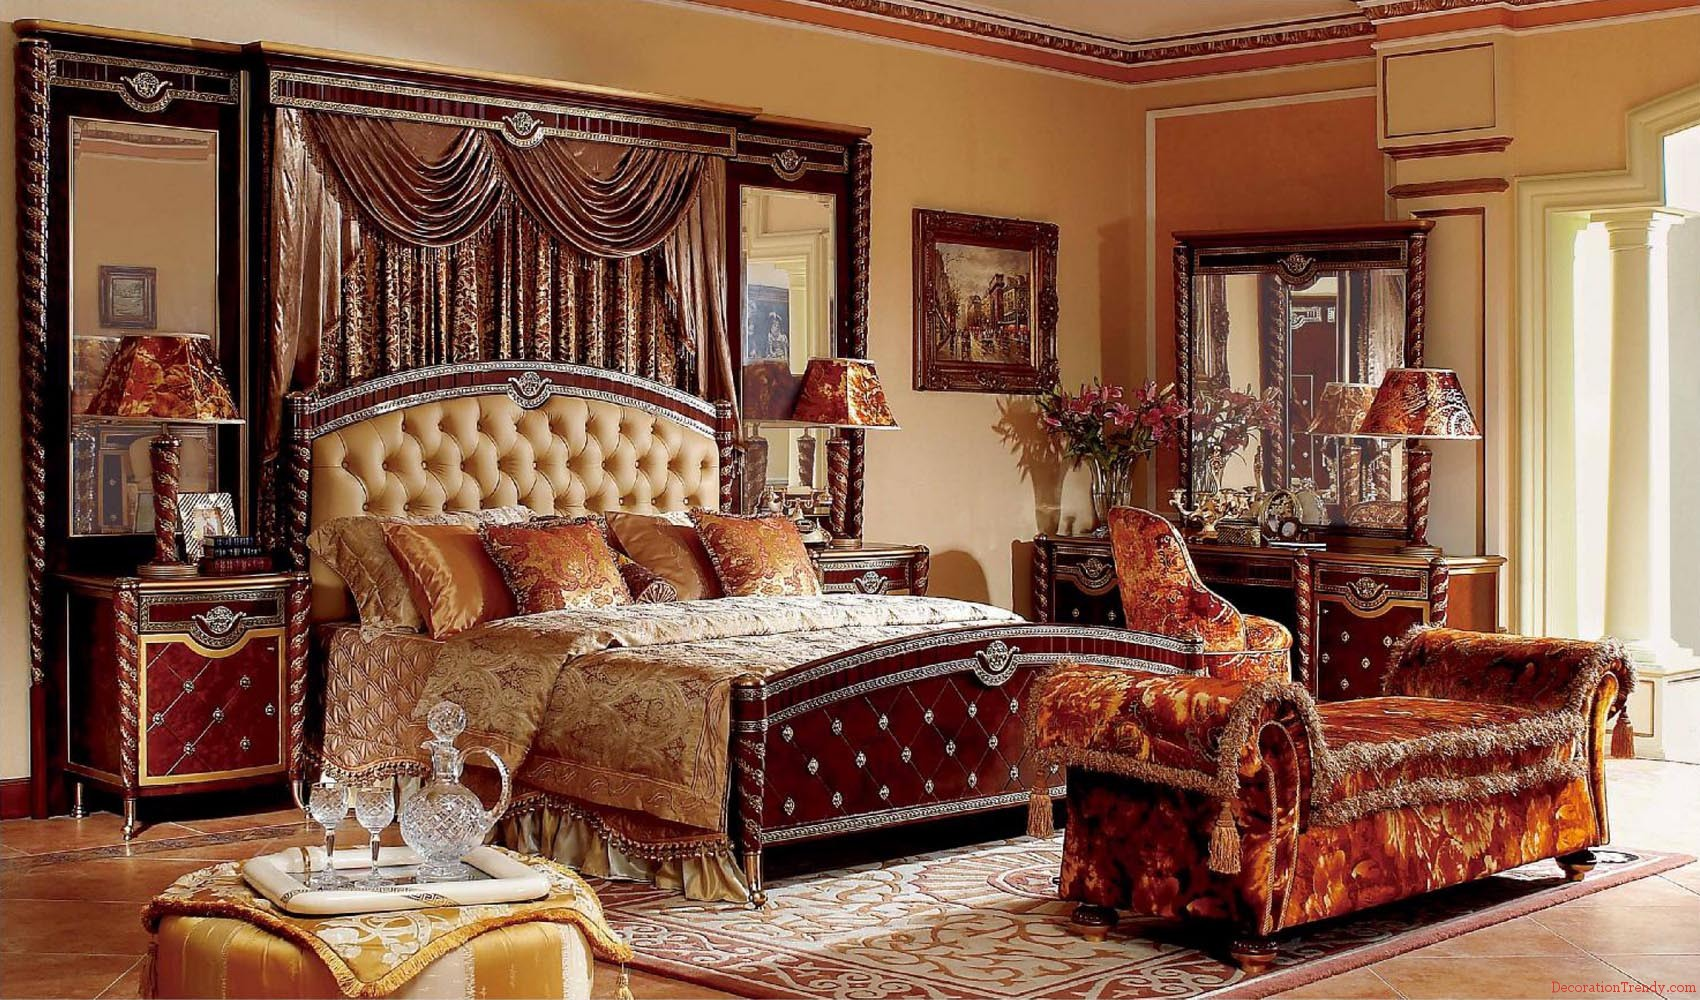 Salon marocain noir et argent: artisanat maroc, artisanat marocain ...